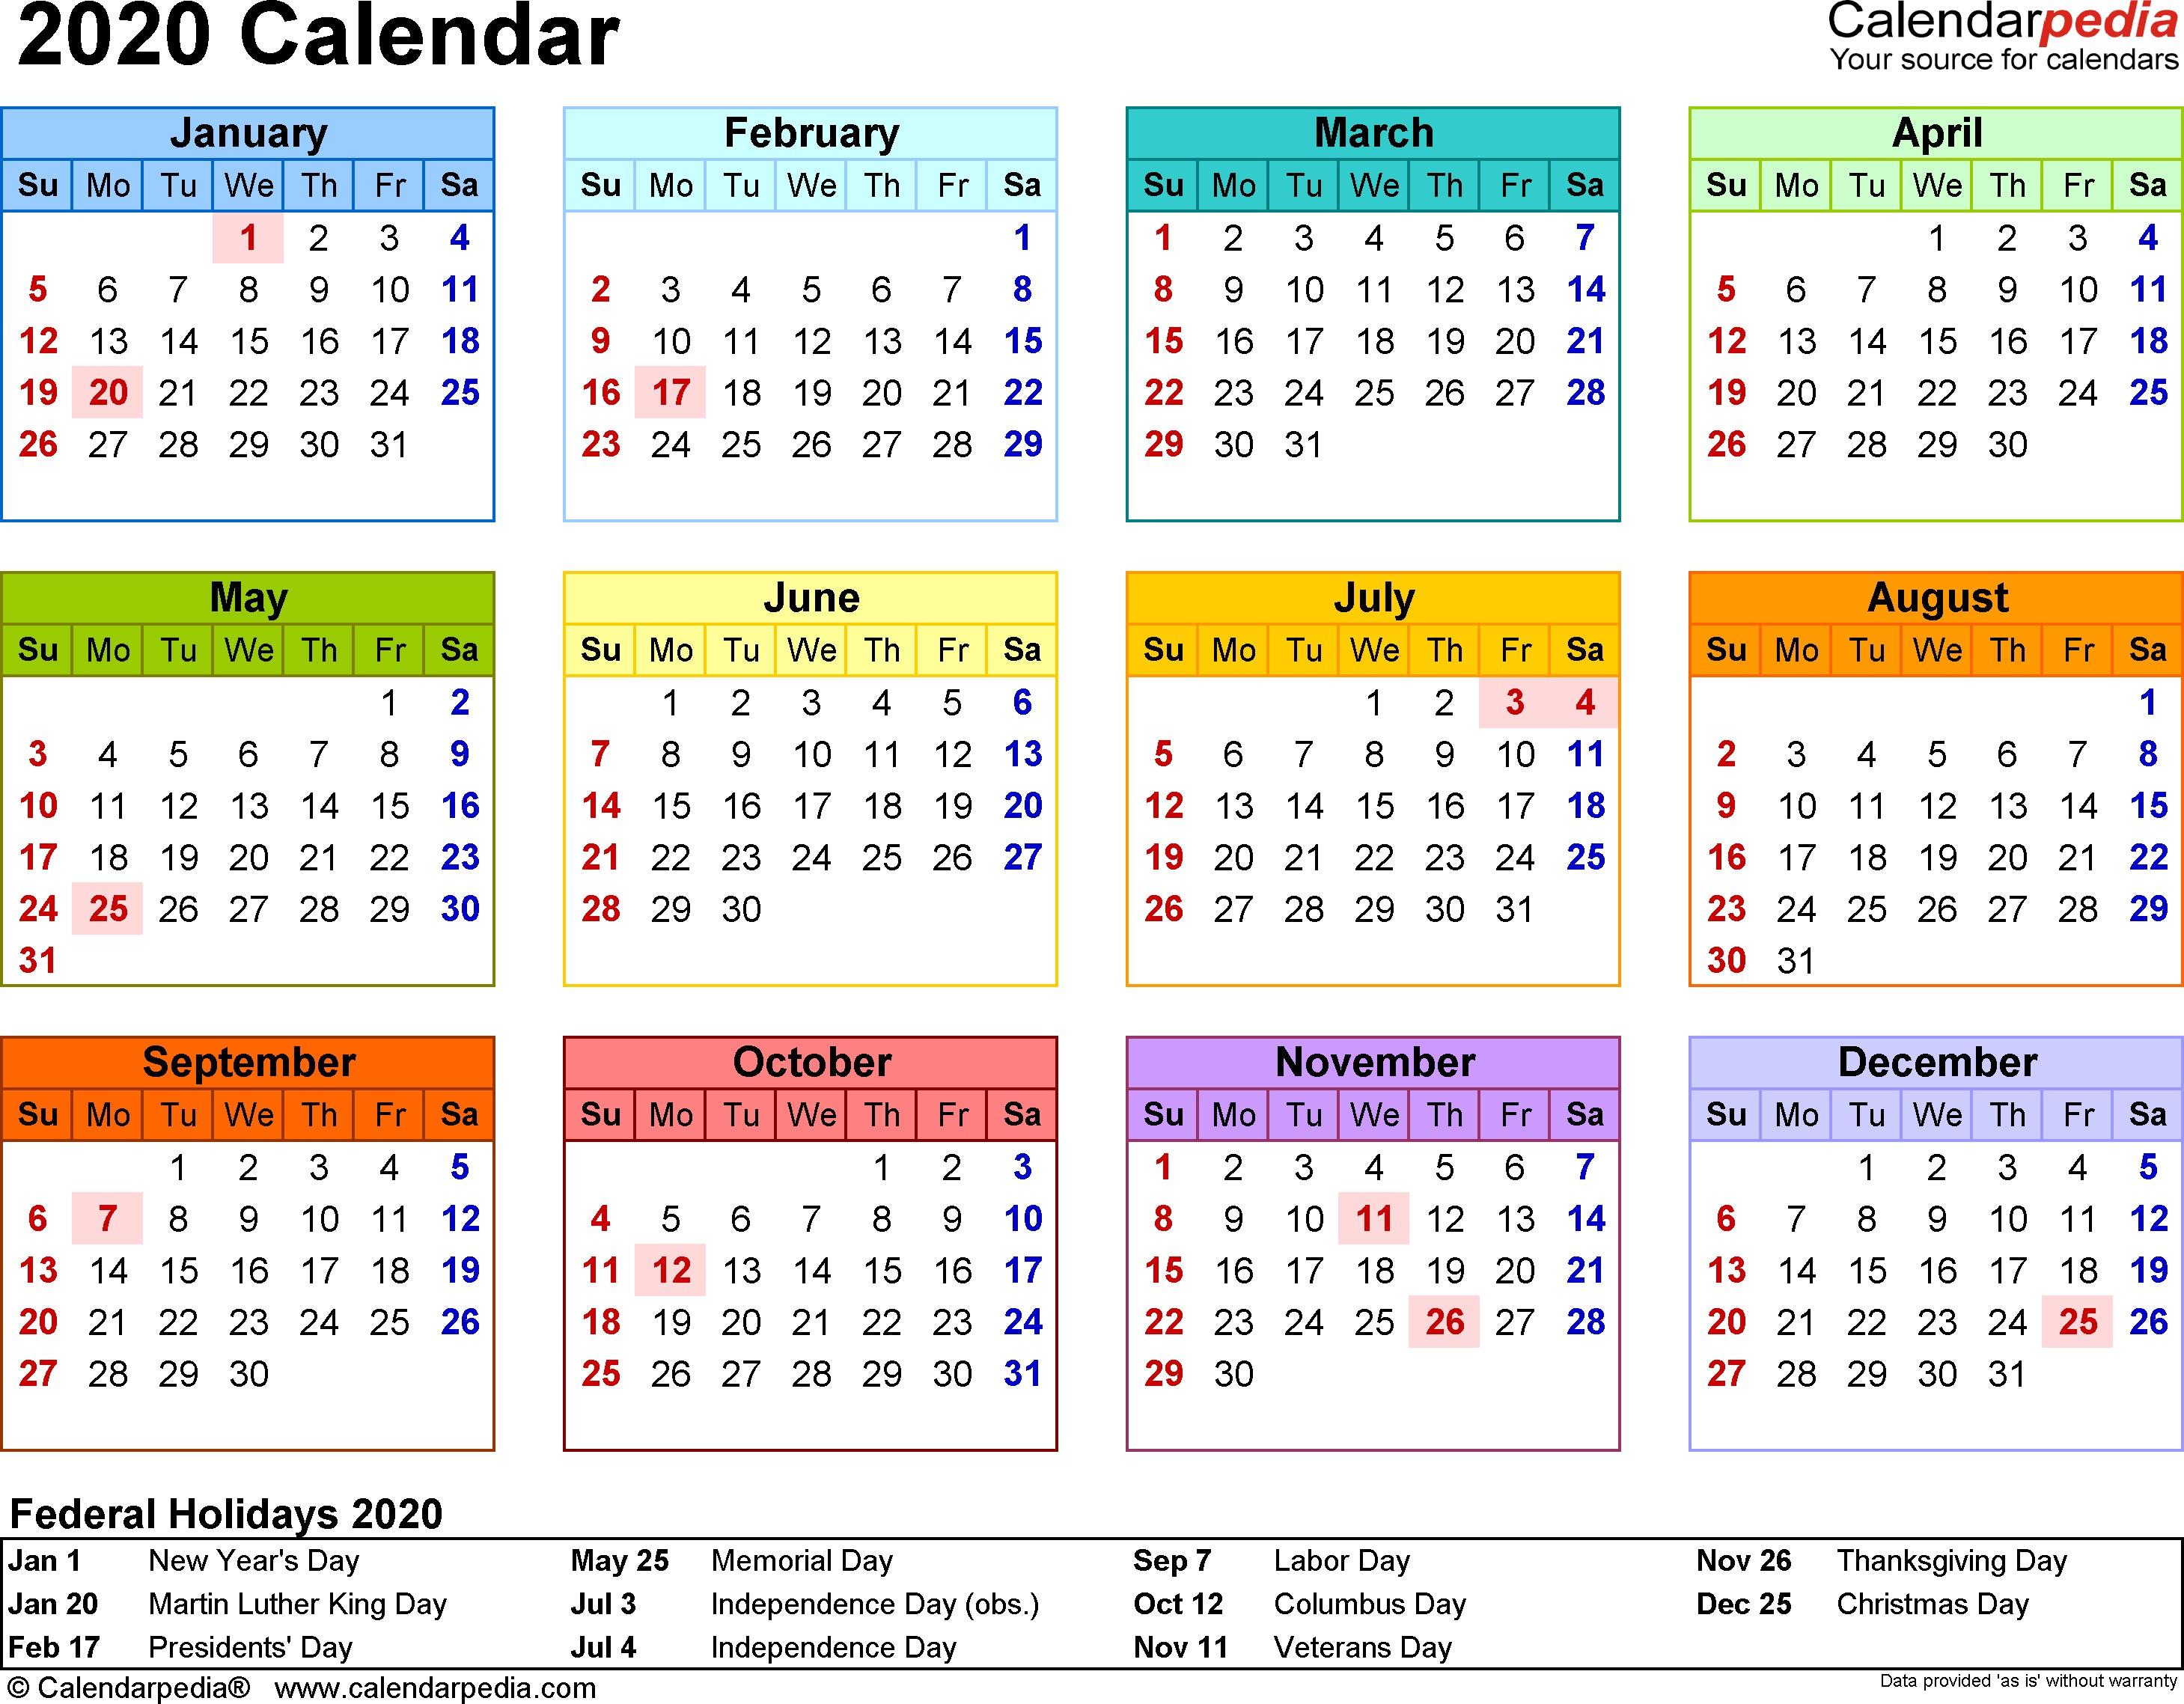 2020 Calendar Download 17 free printable Excel templates